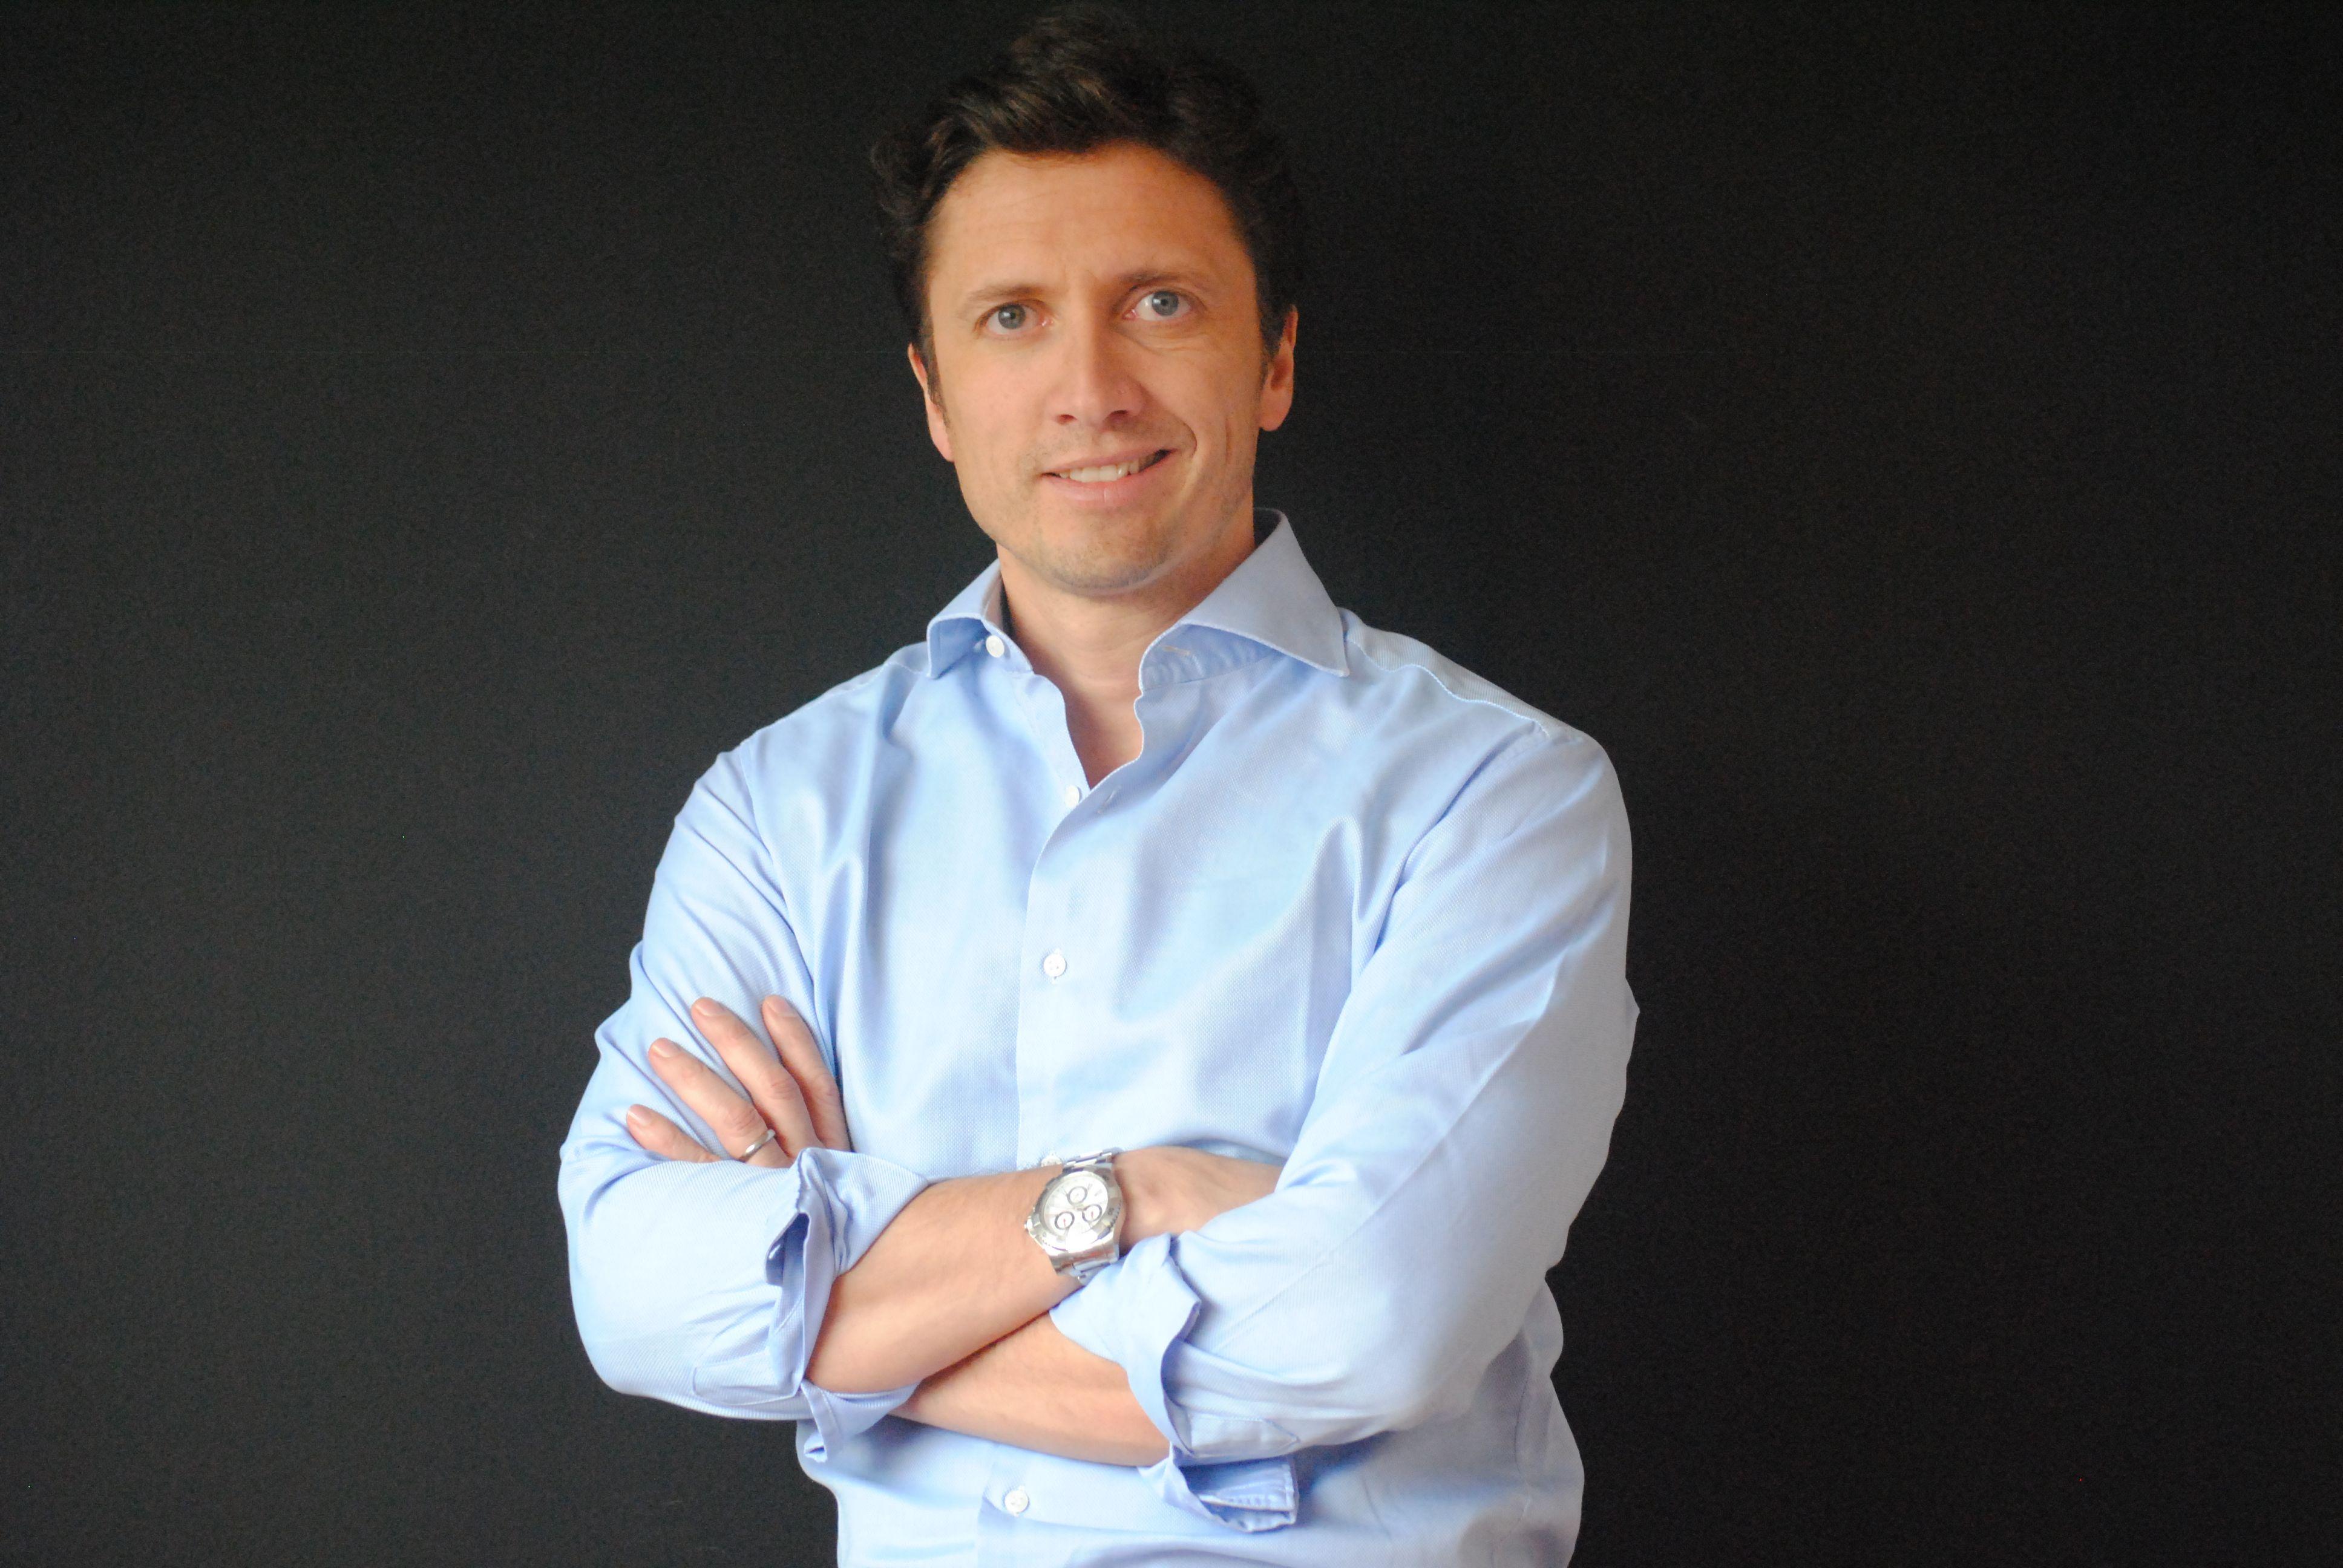 Francisco Sagredo